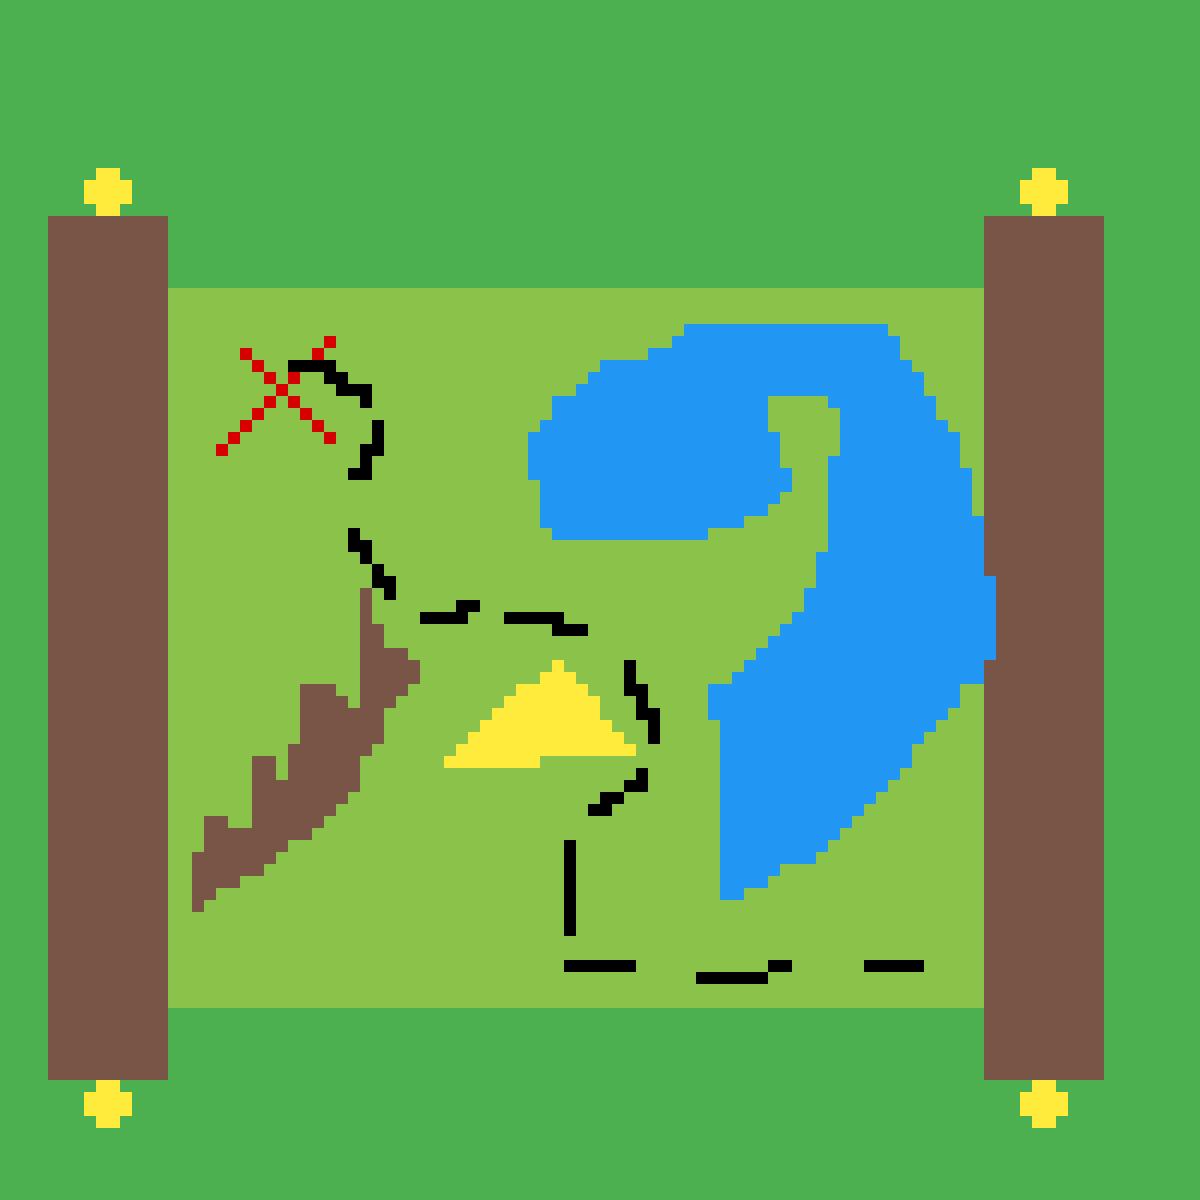 Treasure map by SlinkyWizard628